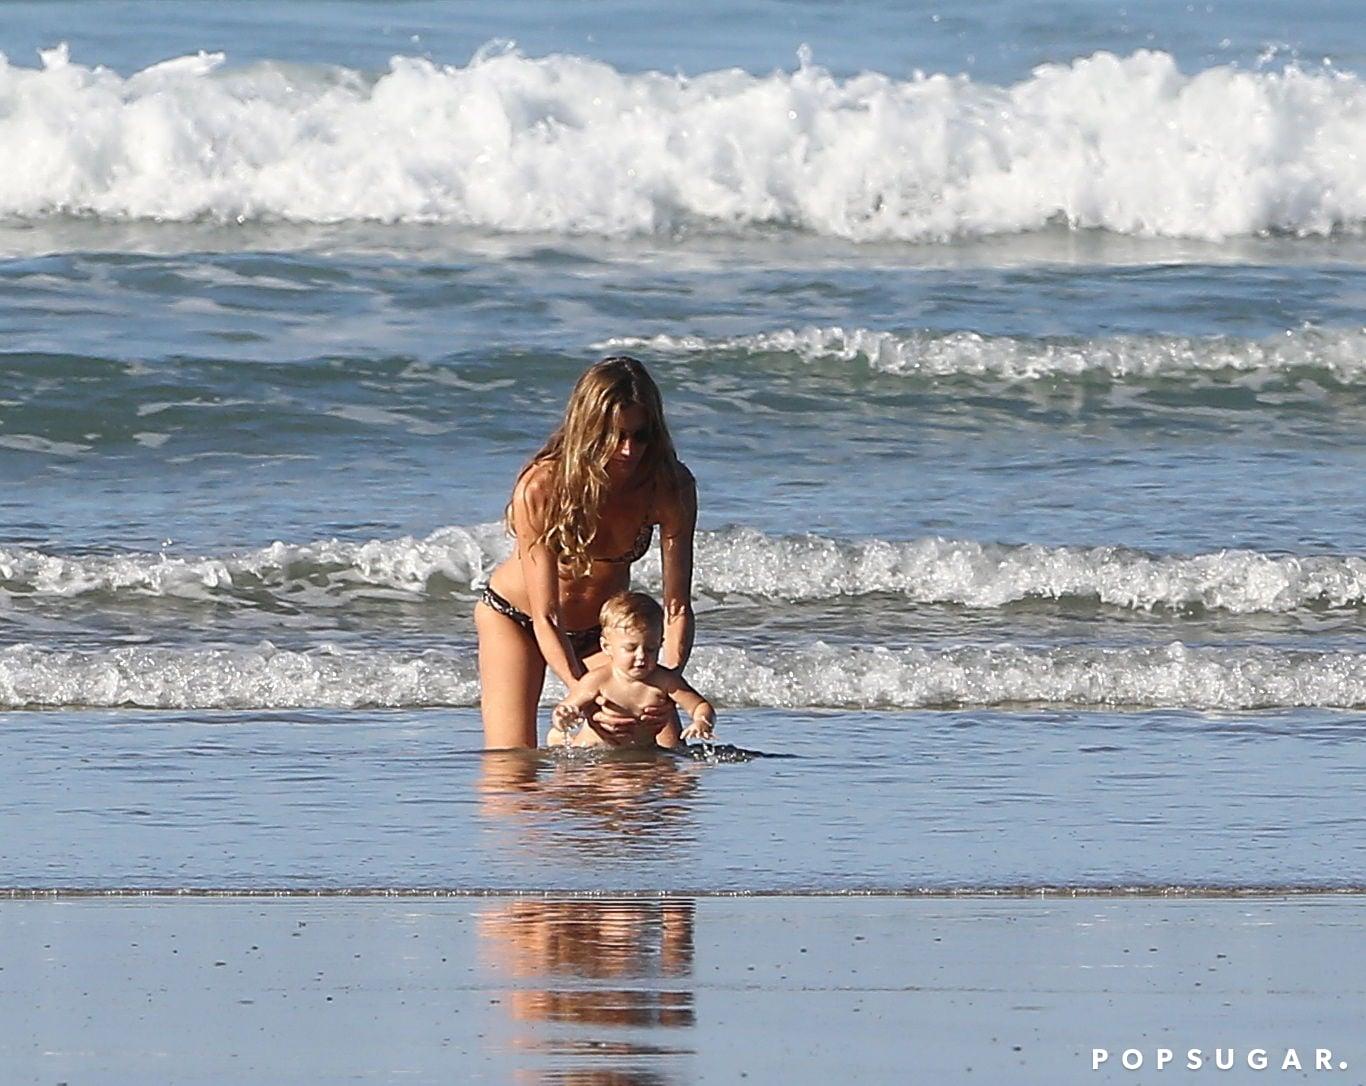 Gisele's Rep Responds to Her Helmet-Free Beach Ride With Vivian